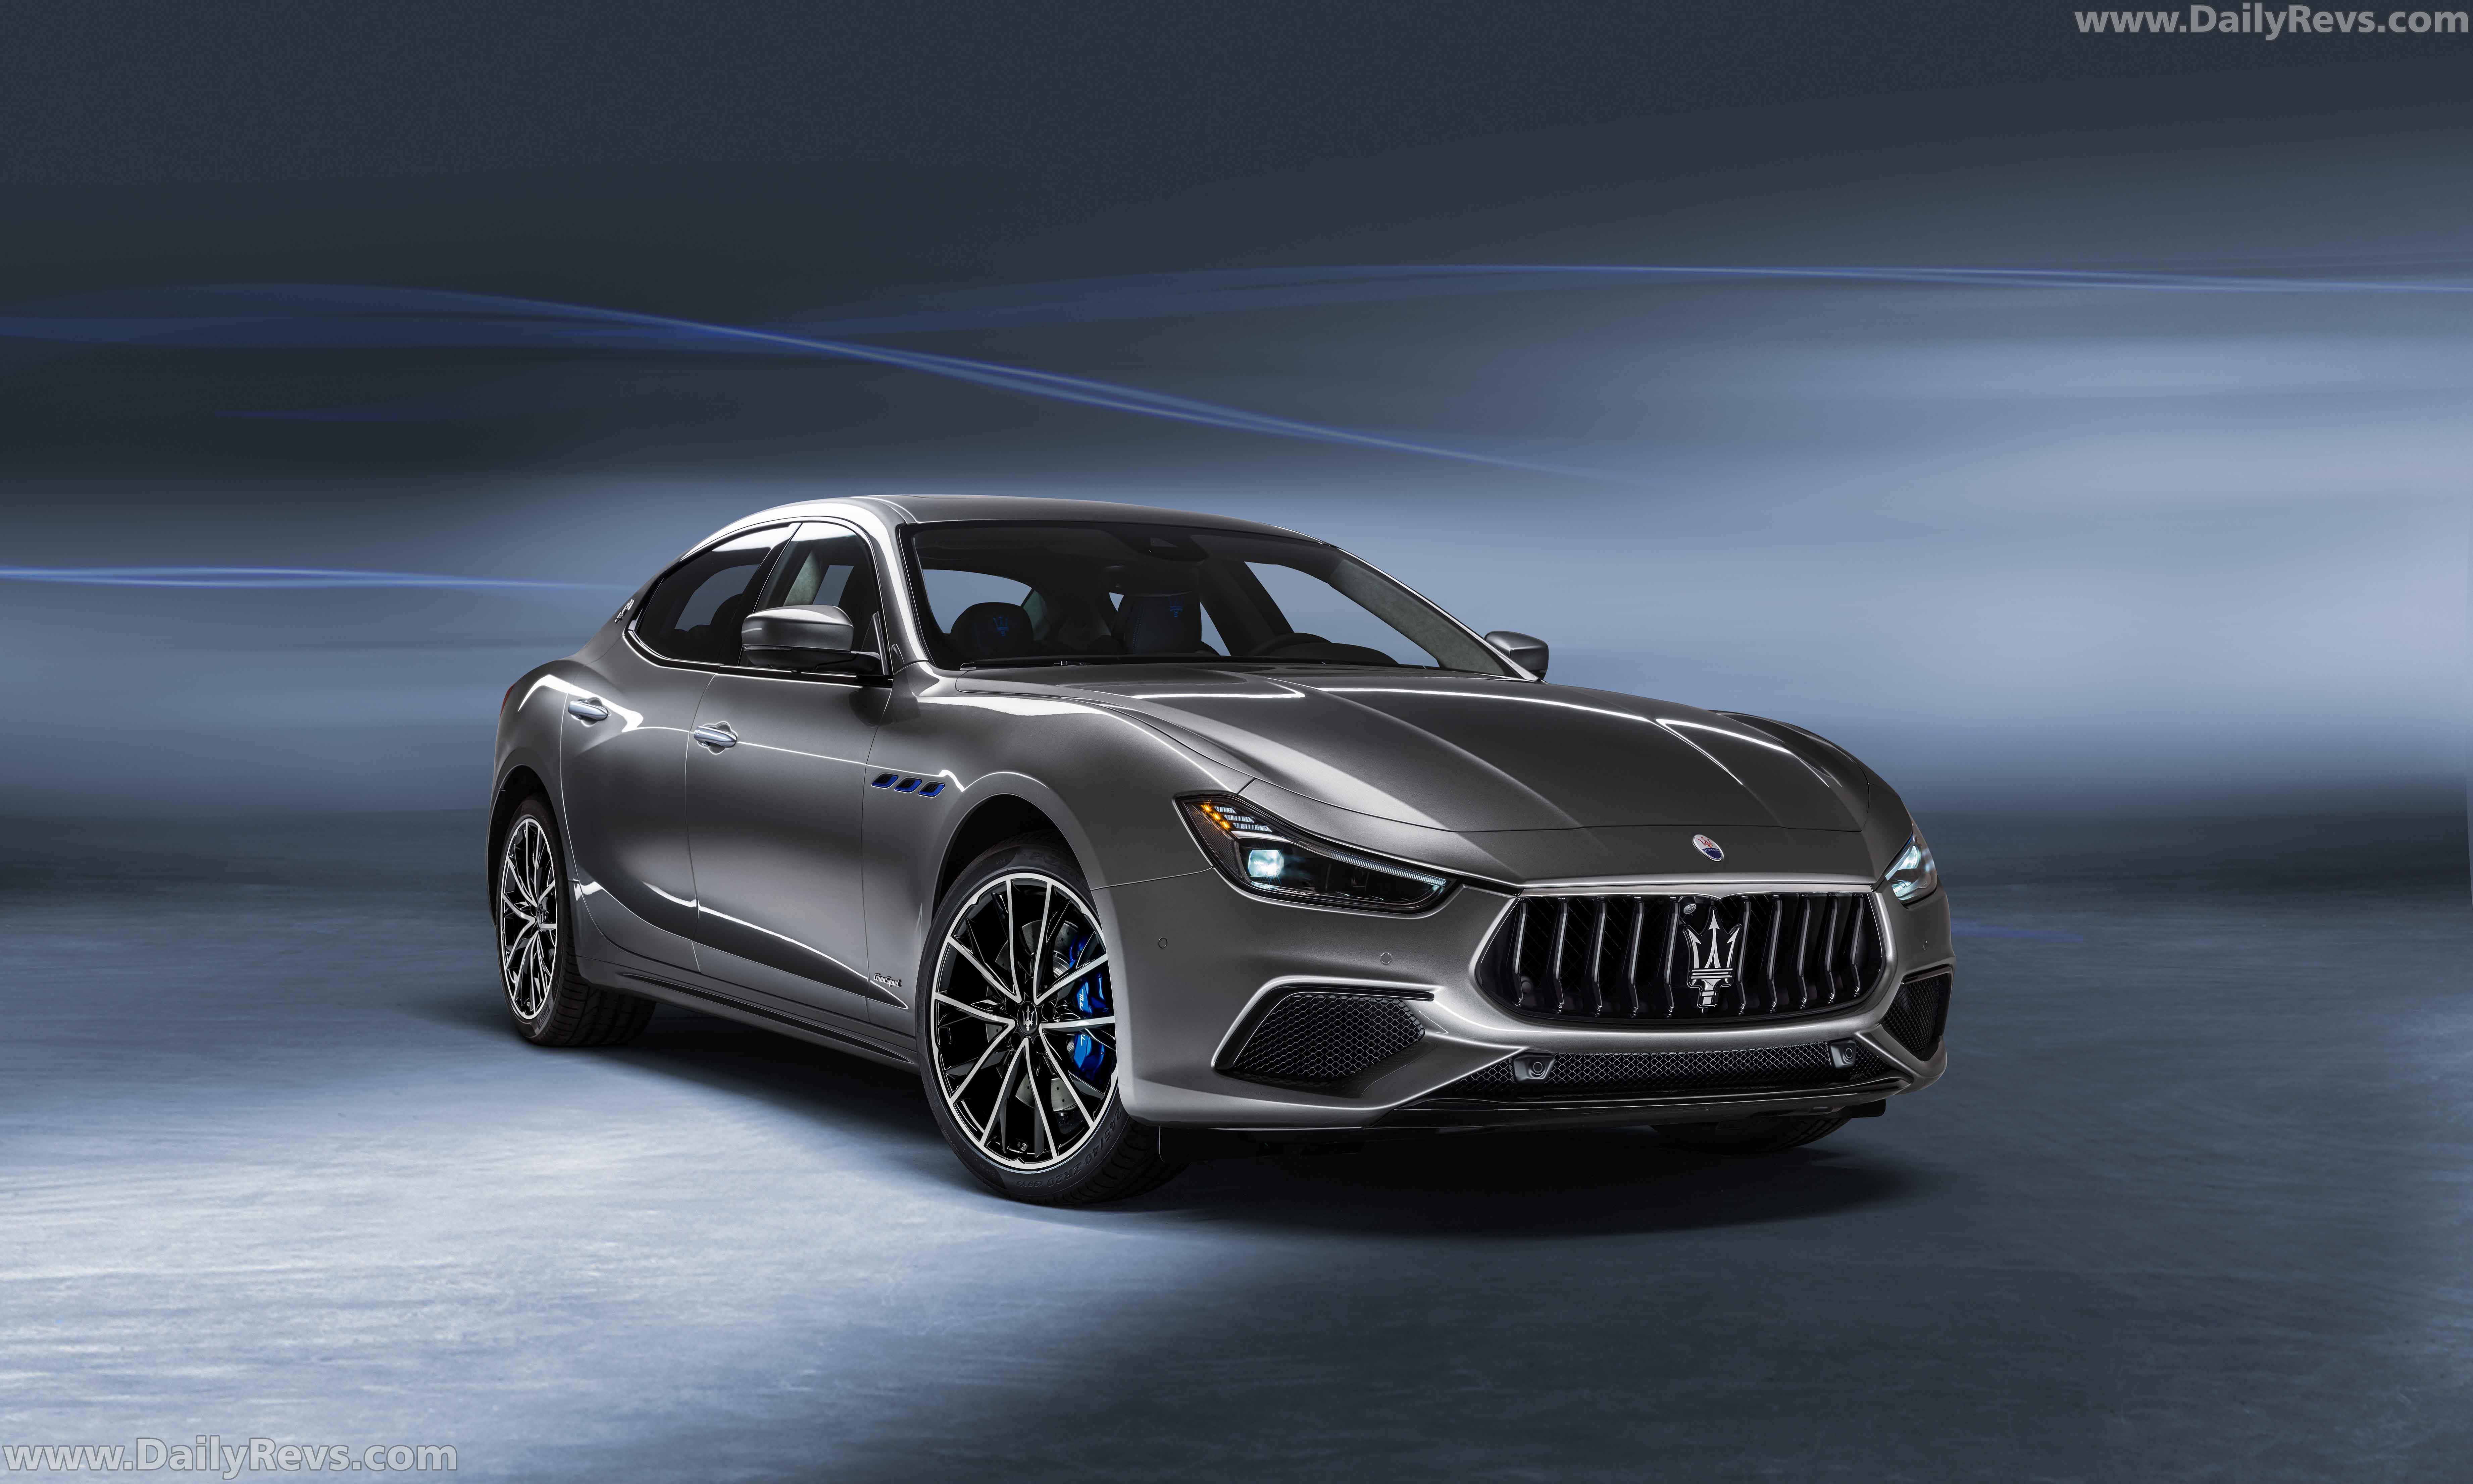 2021 Maserati Ghibli Hybrid full